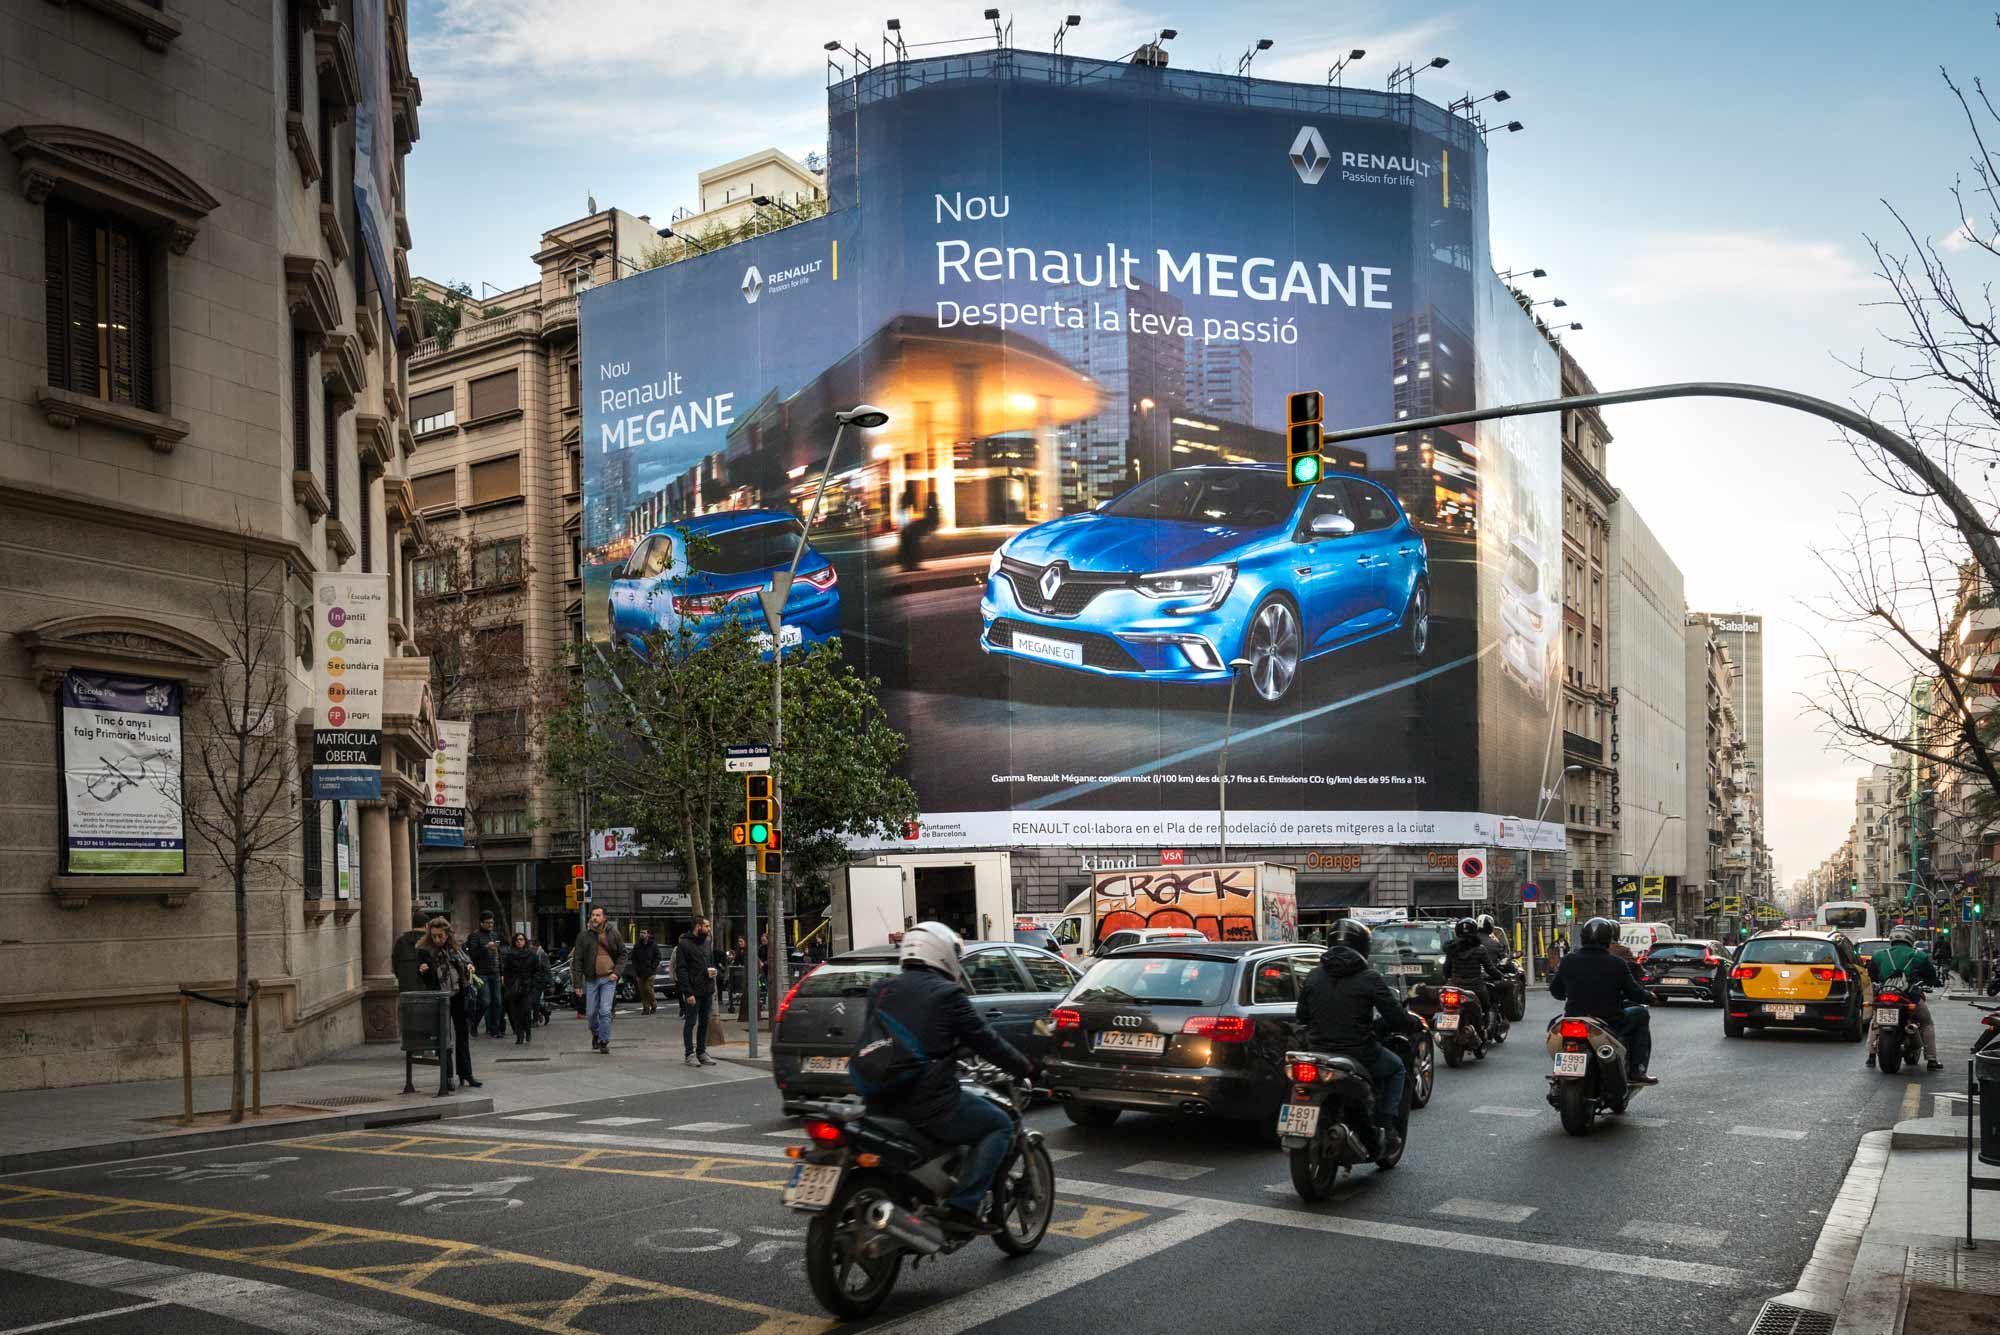 lona-publicitaria-barcelona-balmes-206-renault-megane-dia-vsa-comunicacion